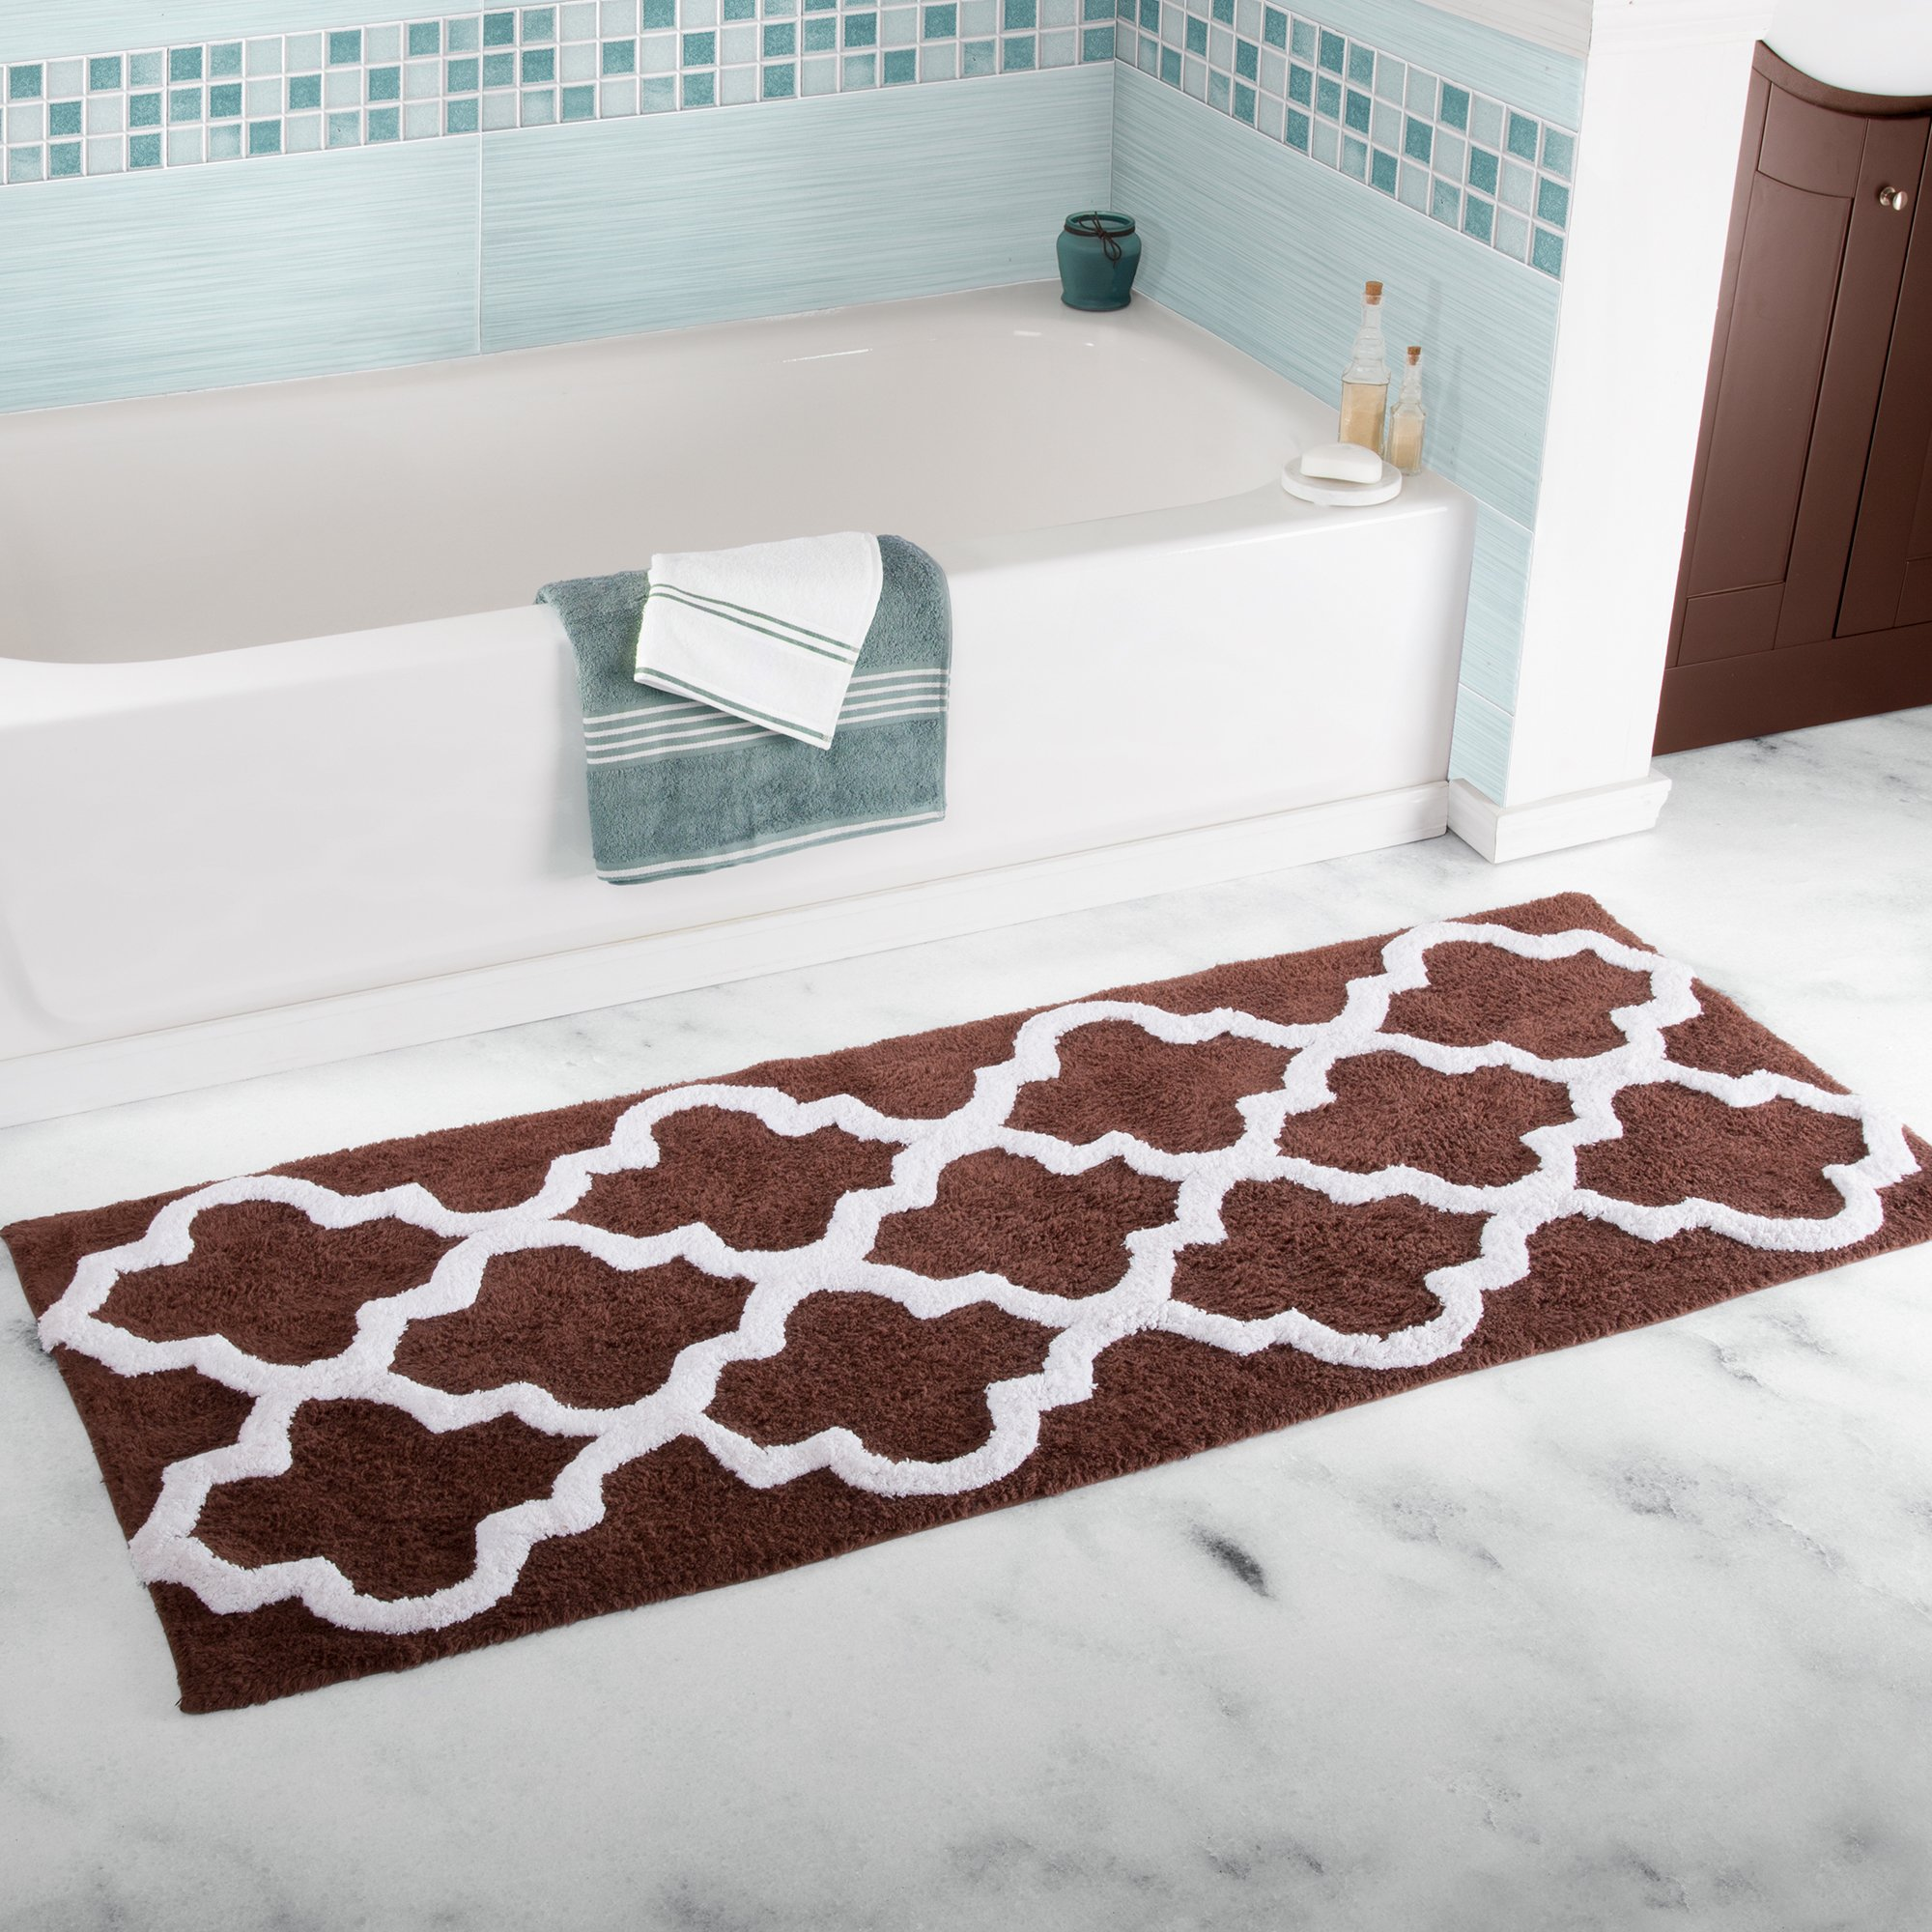 Lavish Home 100% Cotton Trellis Bathroom Mat- 24x60 inches - Chocolate